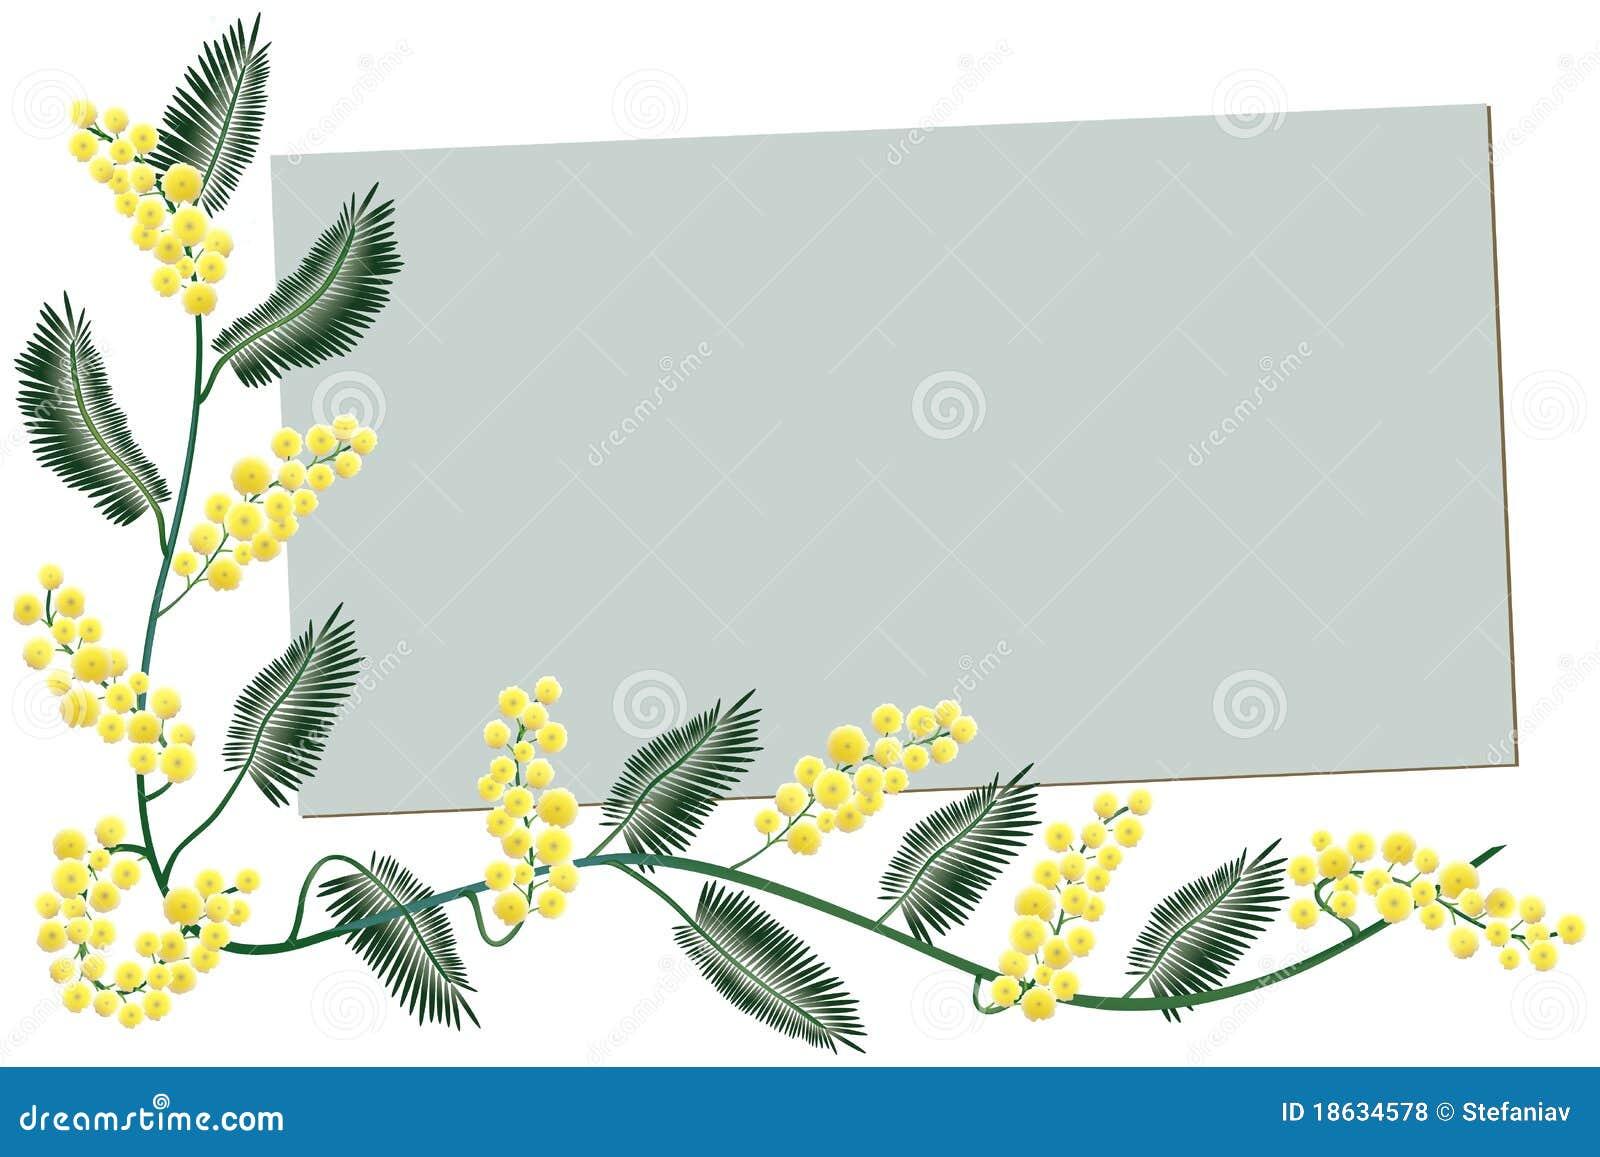 Holiday Wishes Message Mimosa Border - Greeti...